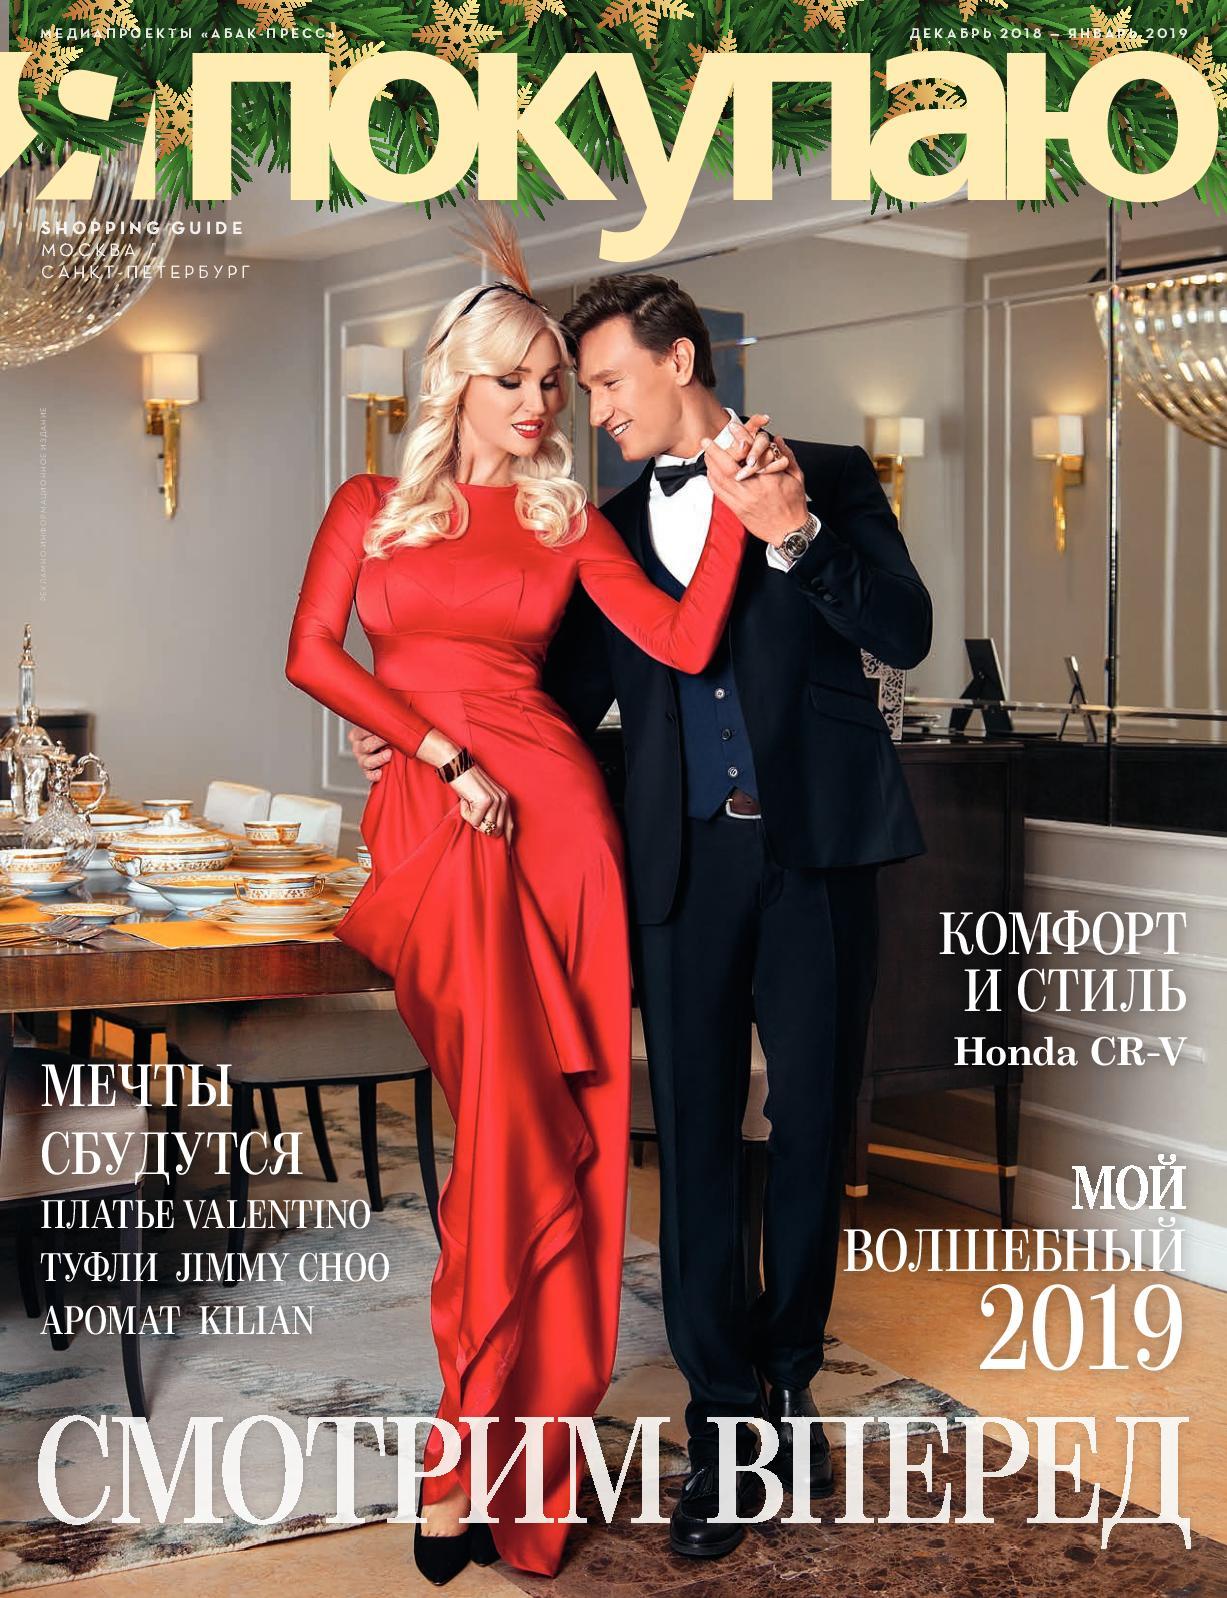 Calaméo - Shopping Guide «Я Покупаю. Москва - Санкт-Петербург», декабрь  2018 - январь 2019 f175b747417